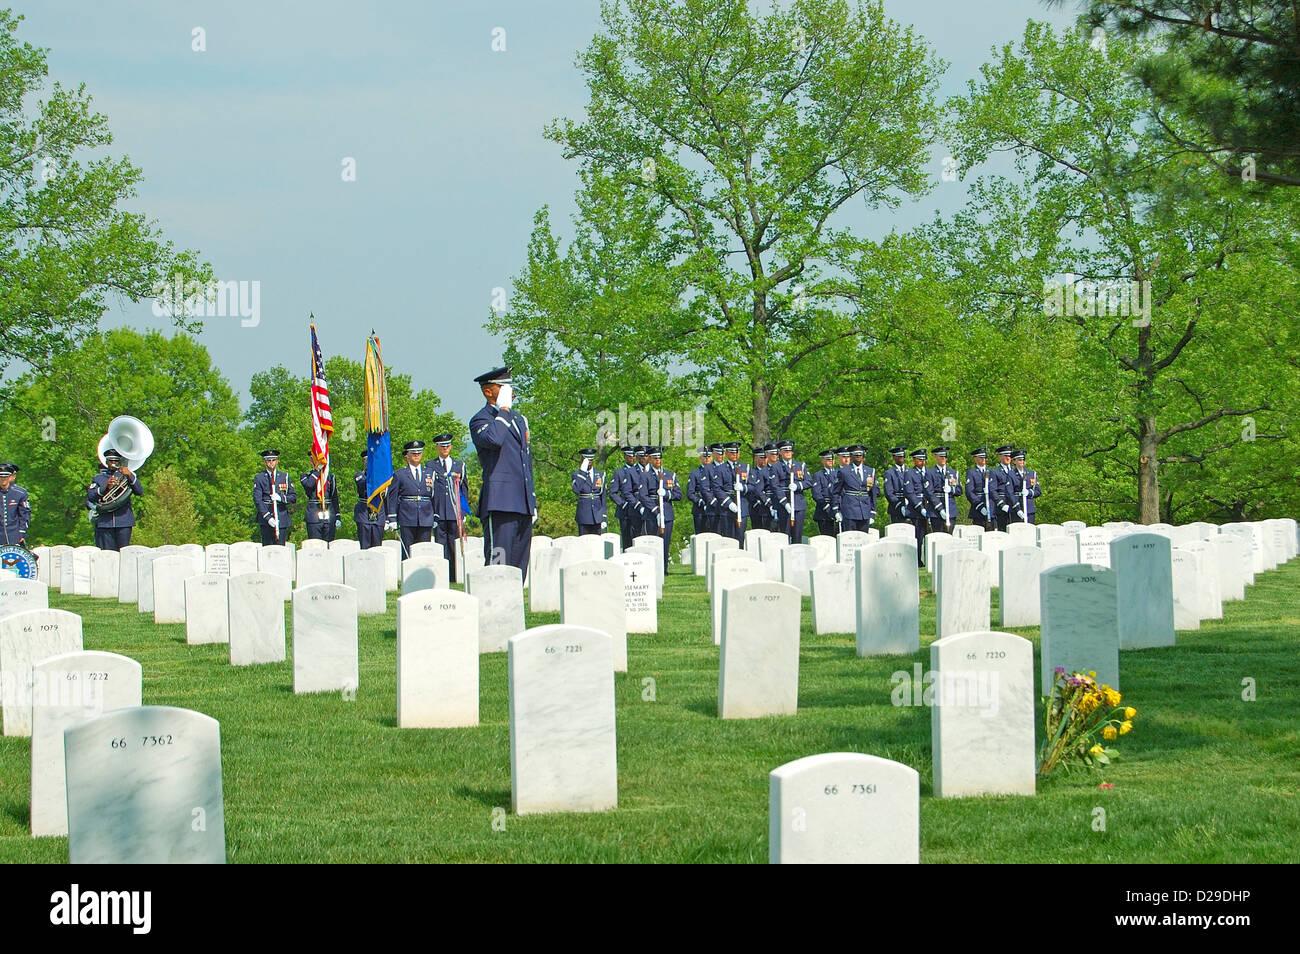 Air Force Honor Guard At A Funeral At Arlington Cemetery, Virginia - Stock Image